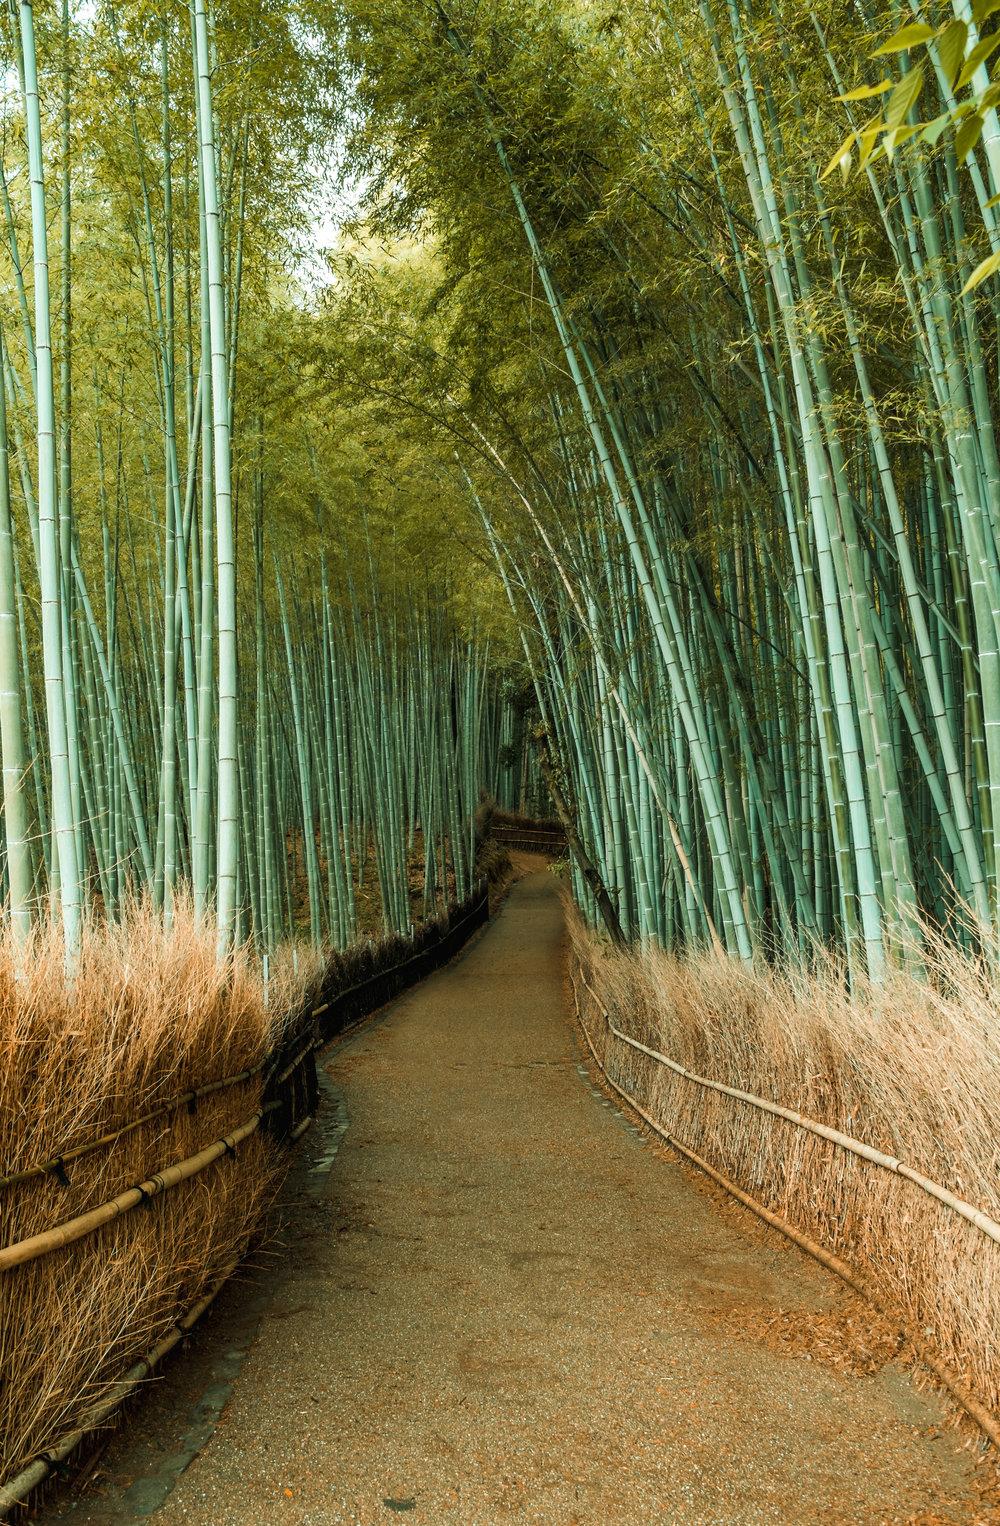 KyotoJapan_2018_AdamDillon_DSCF9778.jpg